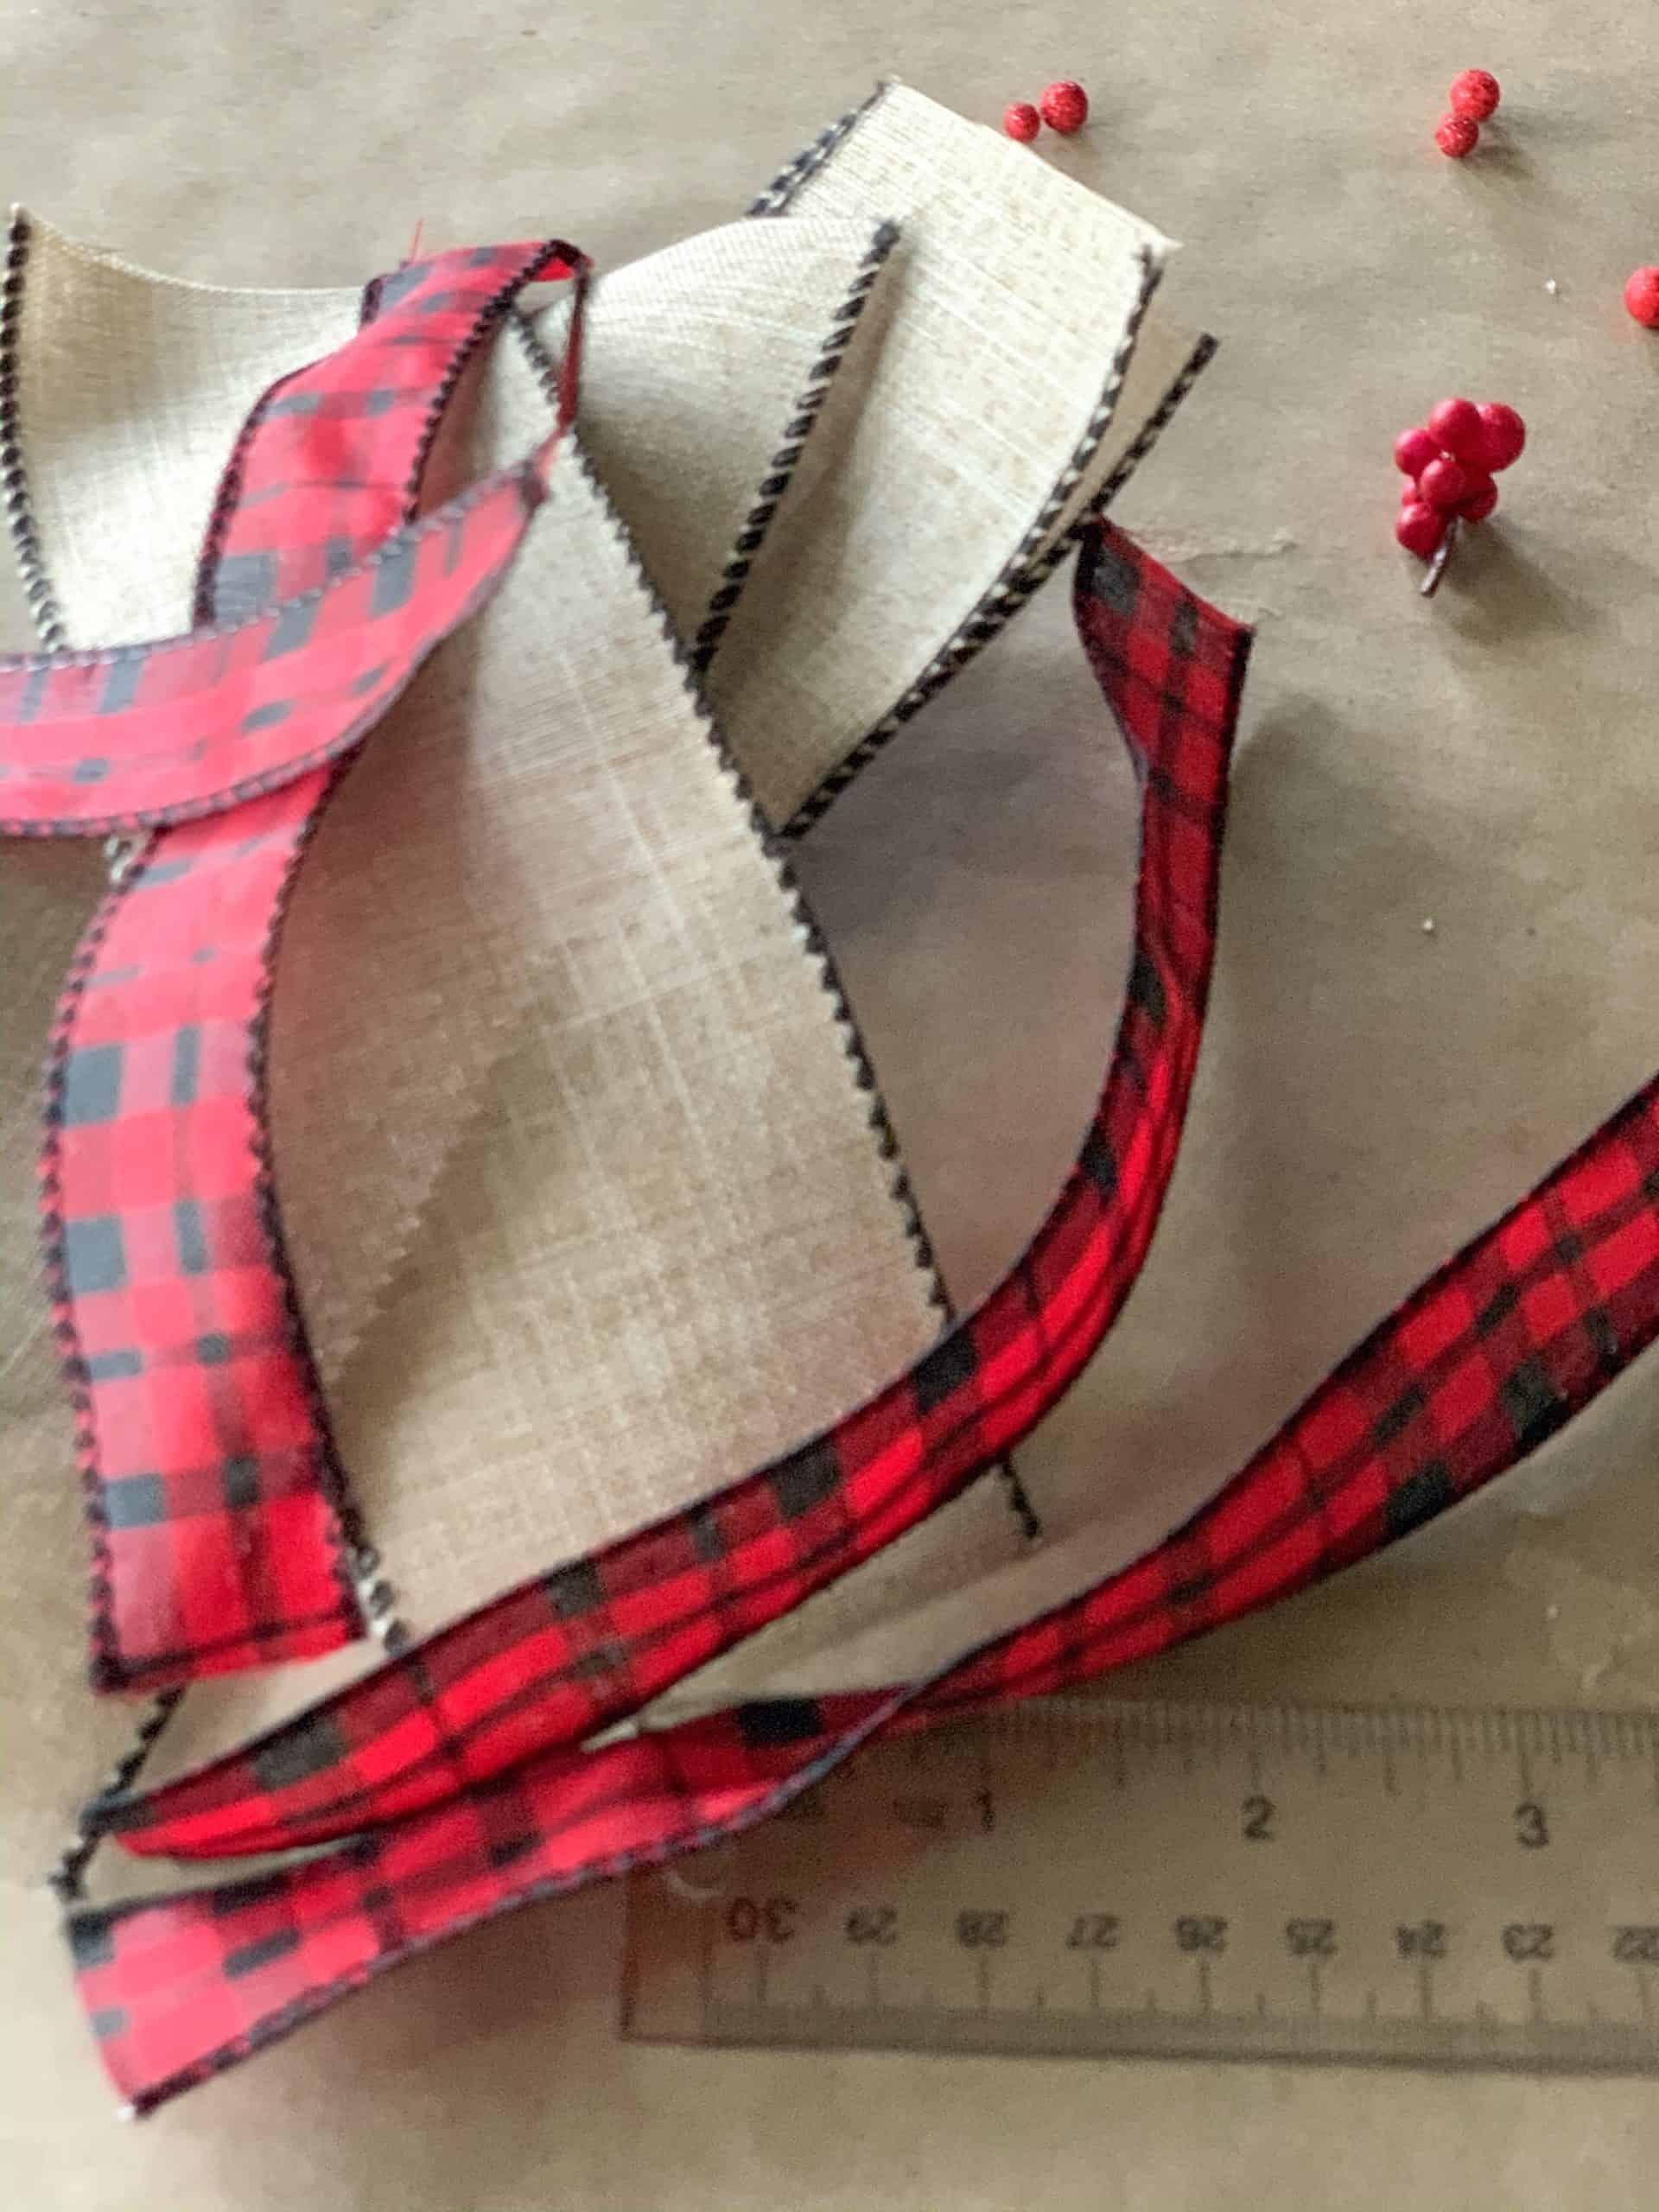 Cut accent ribbon for ribbon poinsettias.